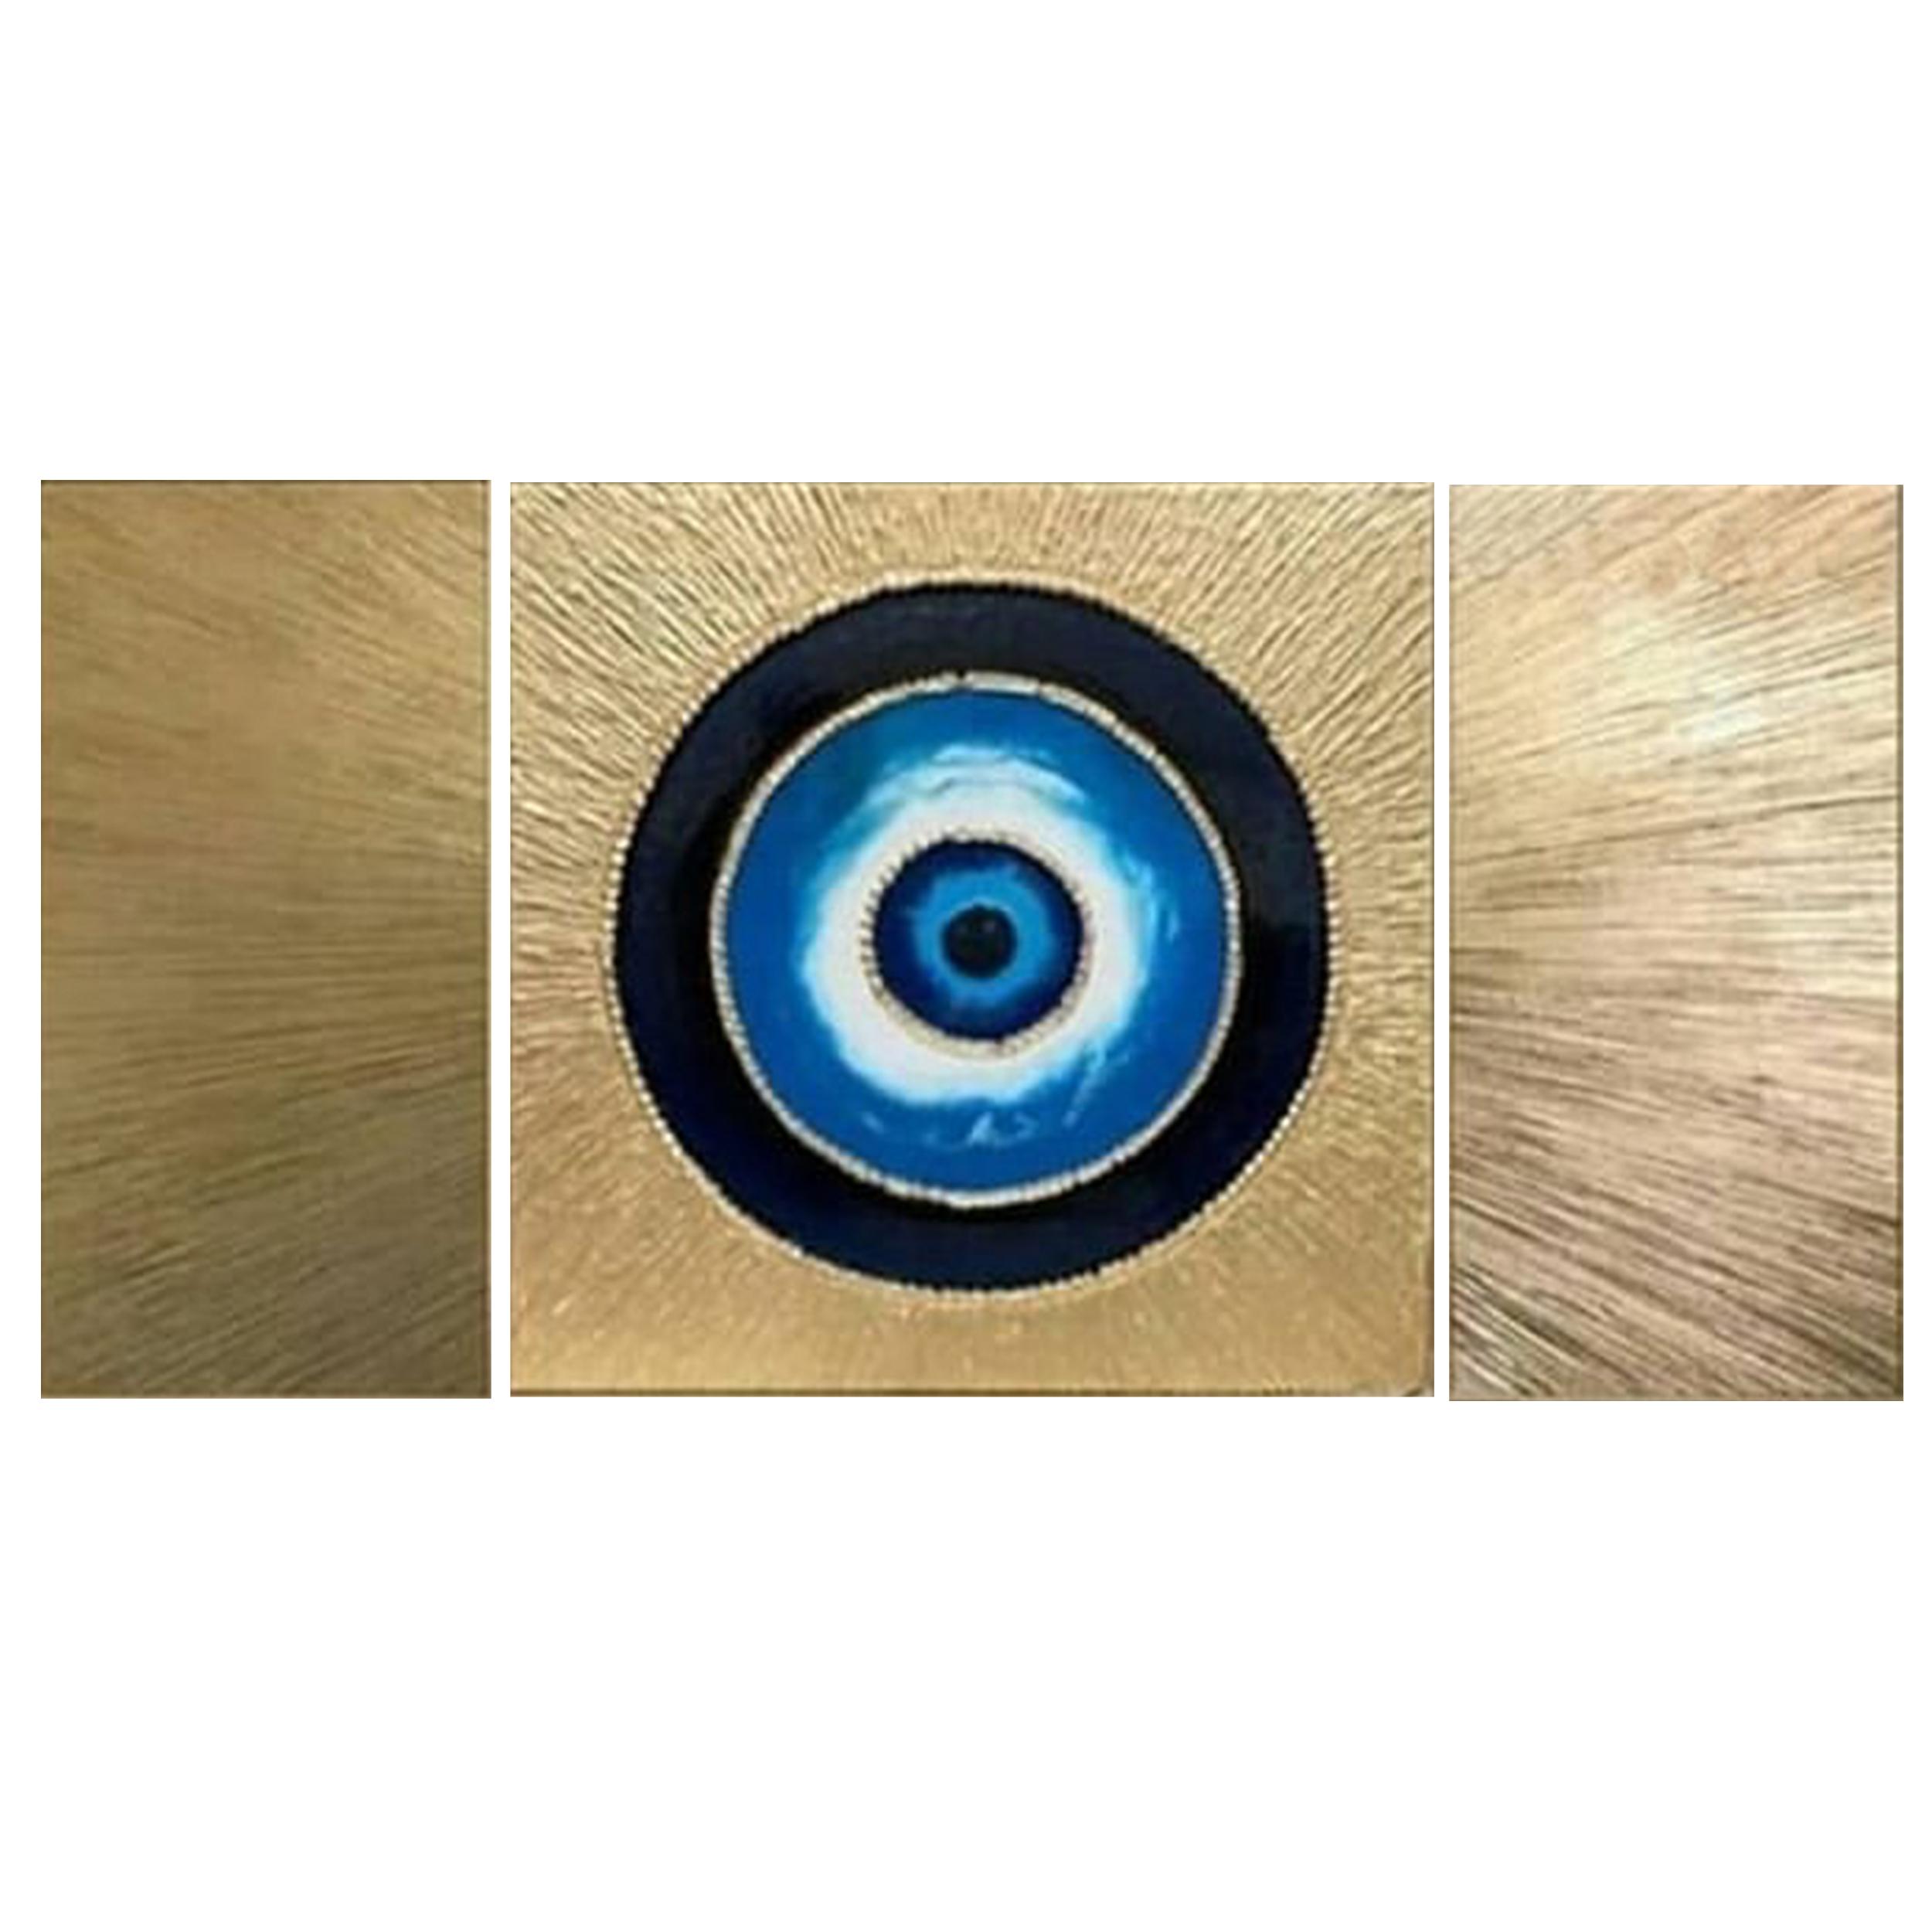 تابلو نقاشی اکریلیک طرح چشم نظر مجموعه سه عددی